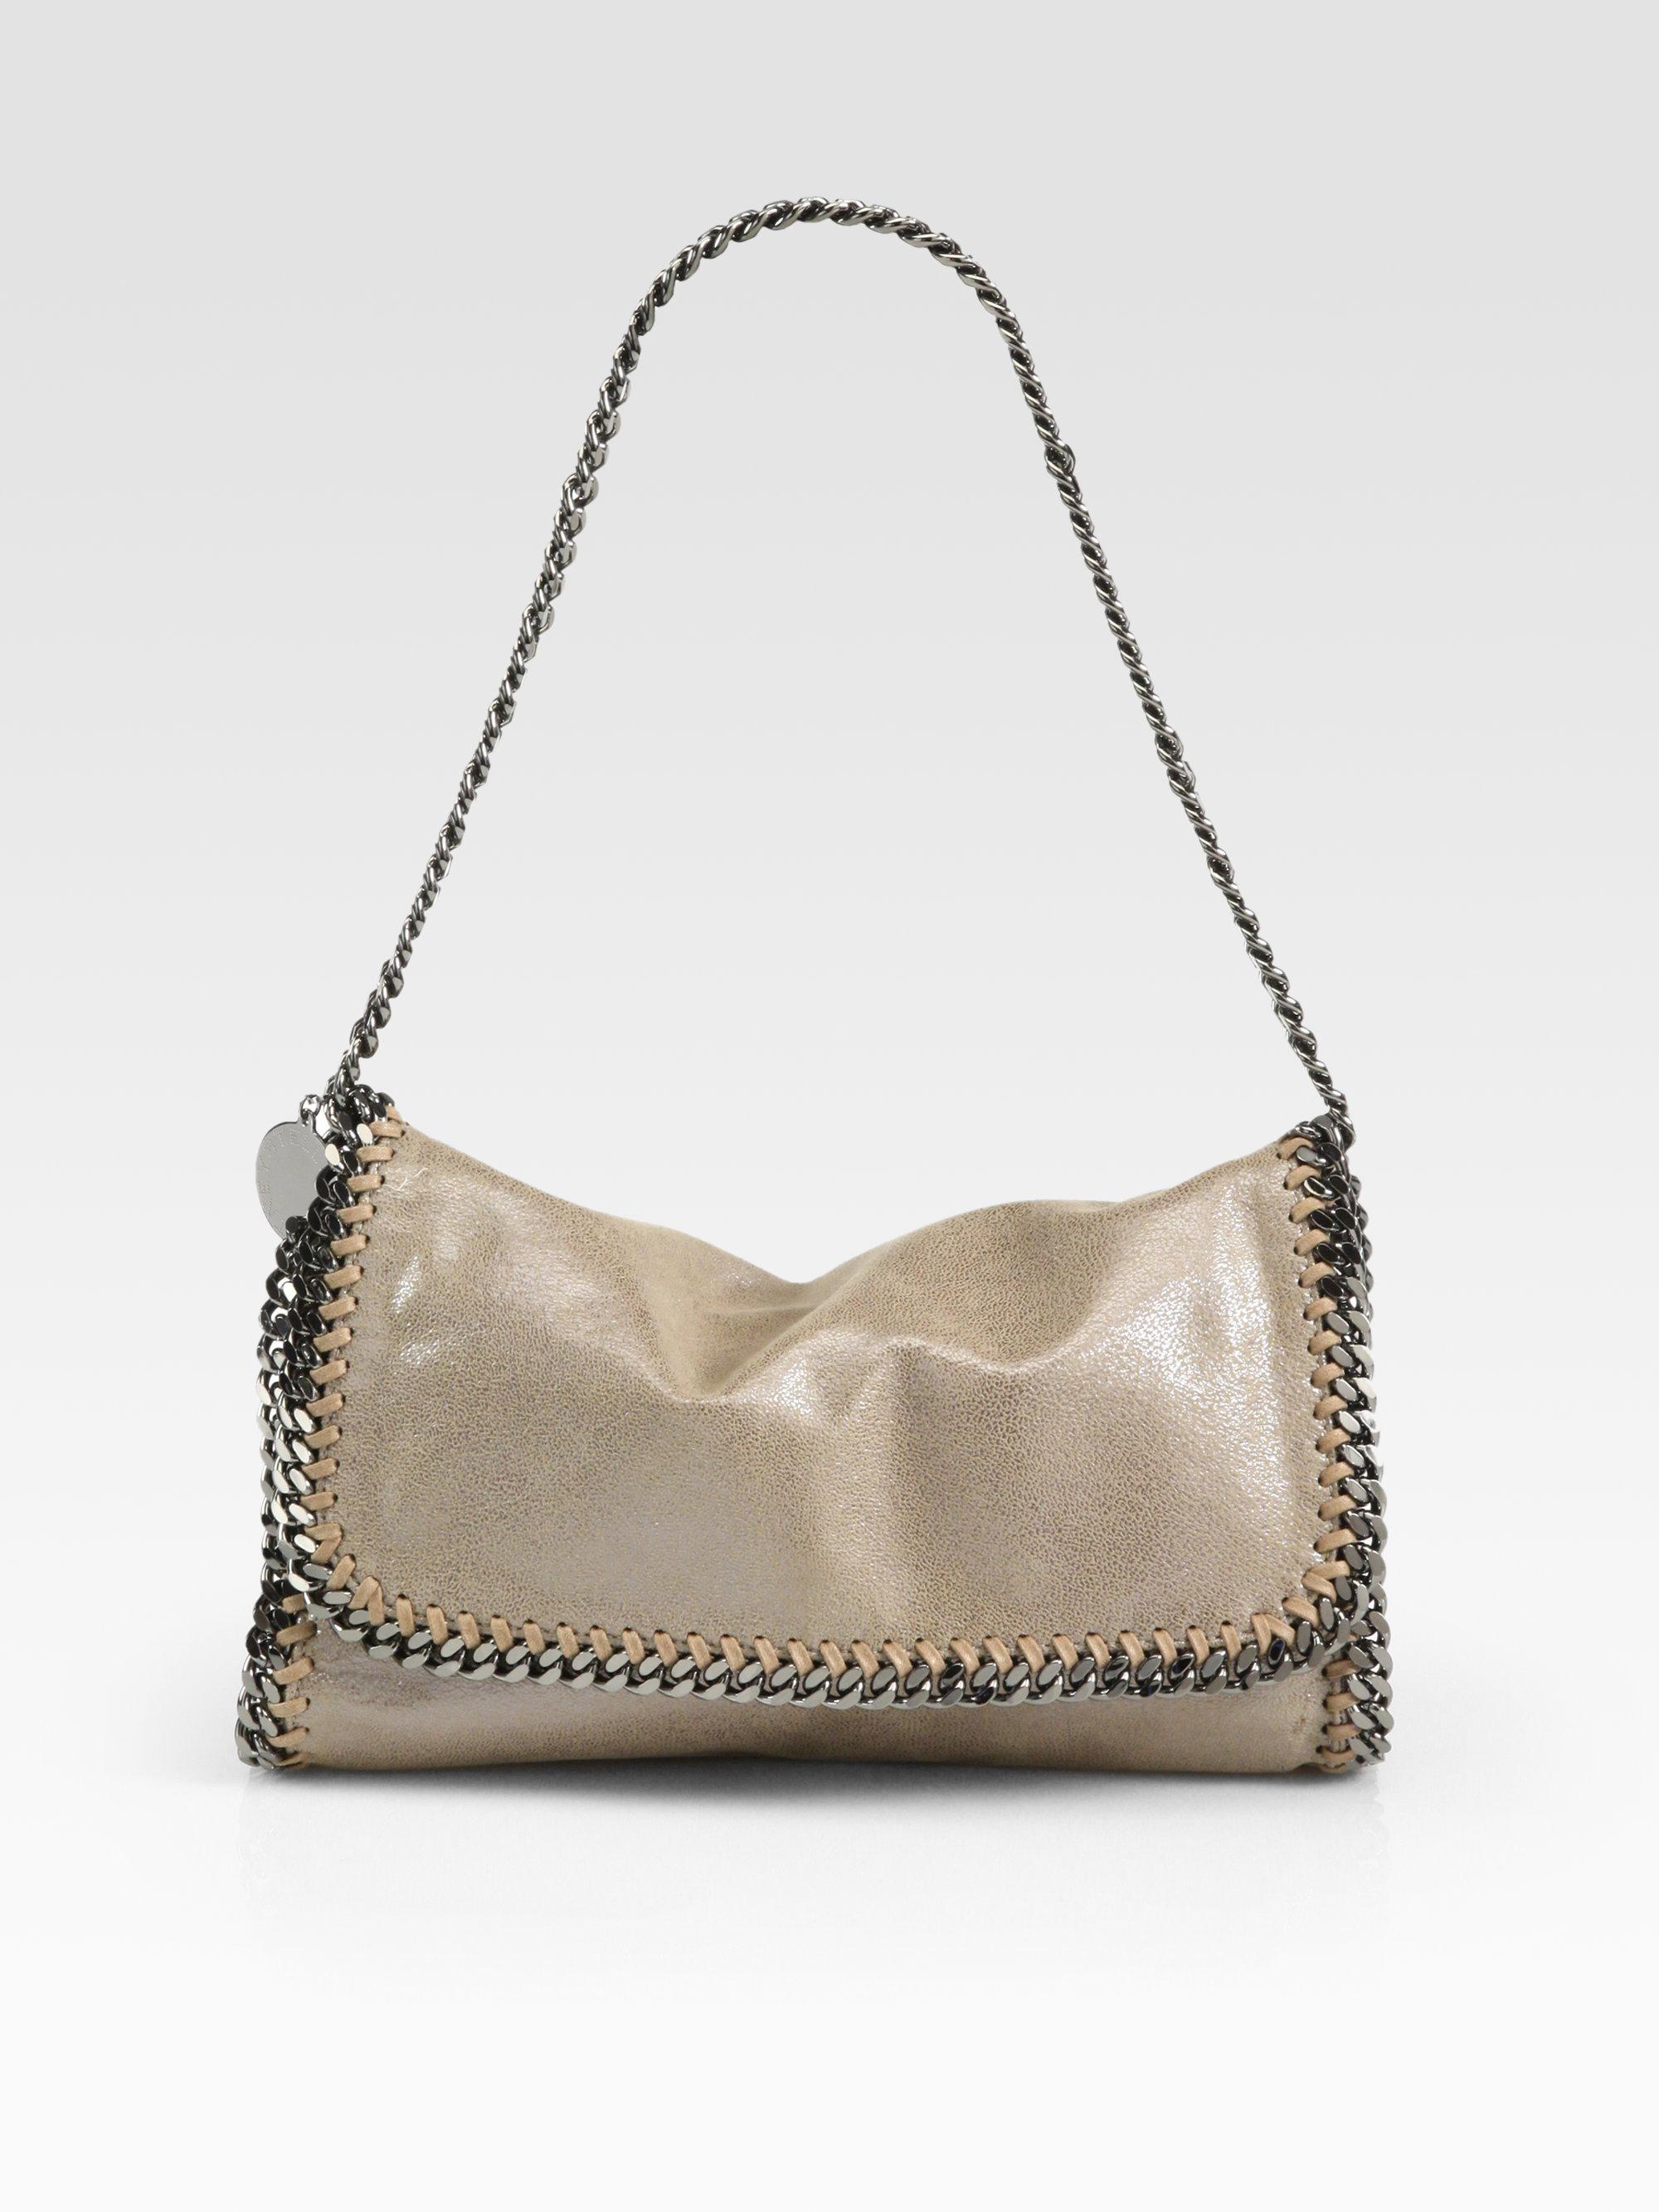 7c087a49d4 Stella Mccartney Metallic Shoulder Bag in Brown - Lyst